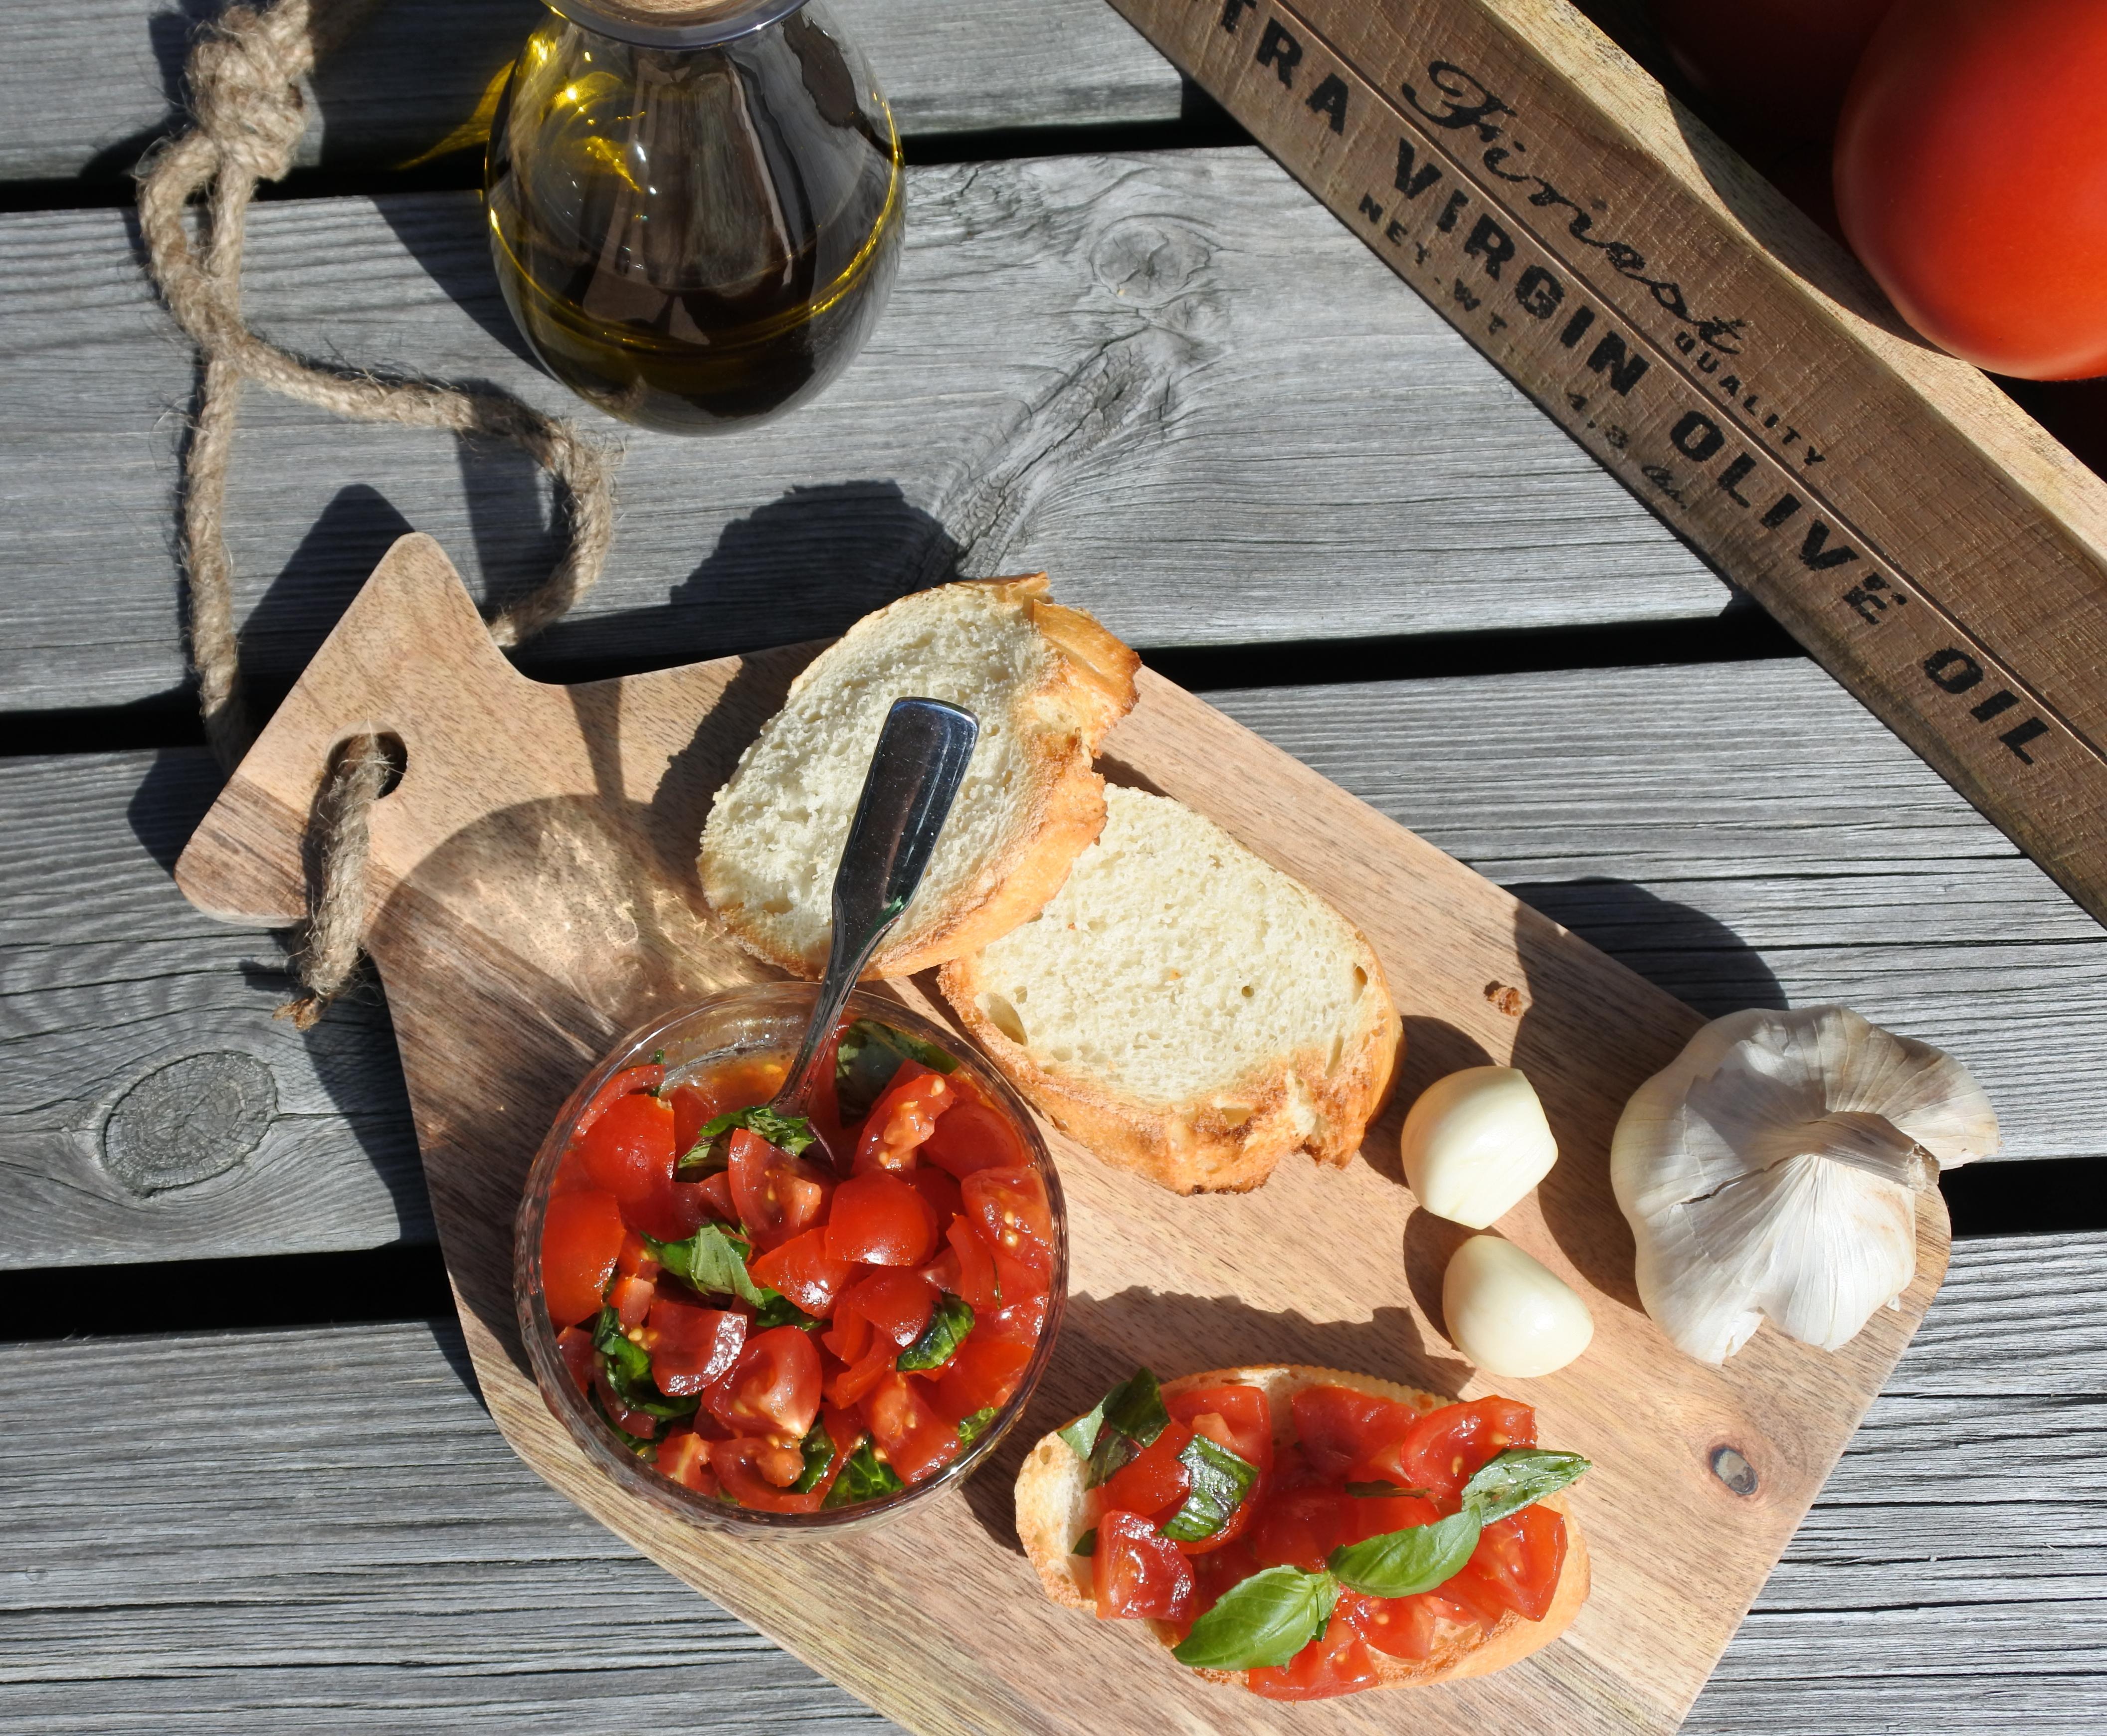 Bruschetta med tomater og basilikum(Bruschetta al pomodoro e basilico)